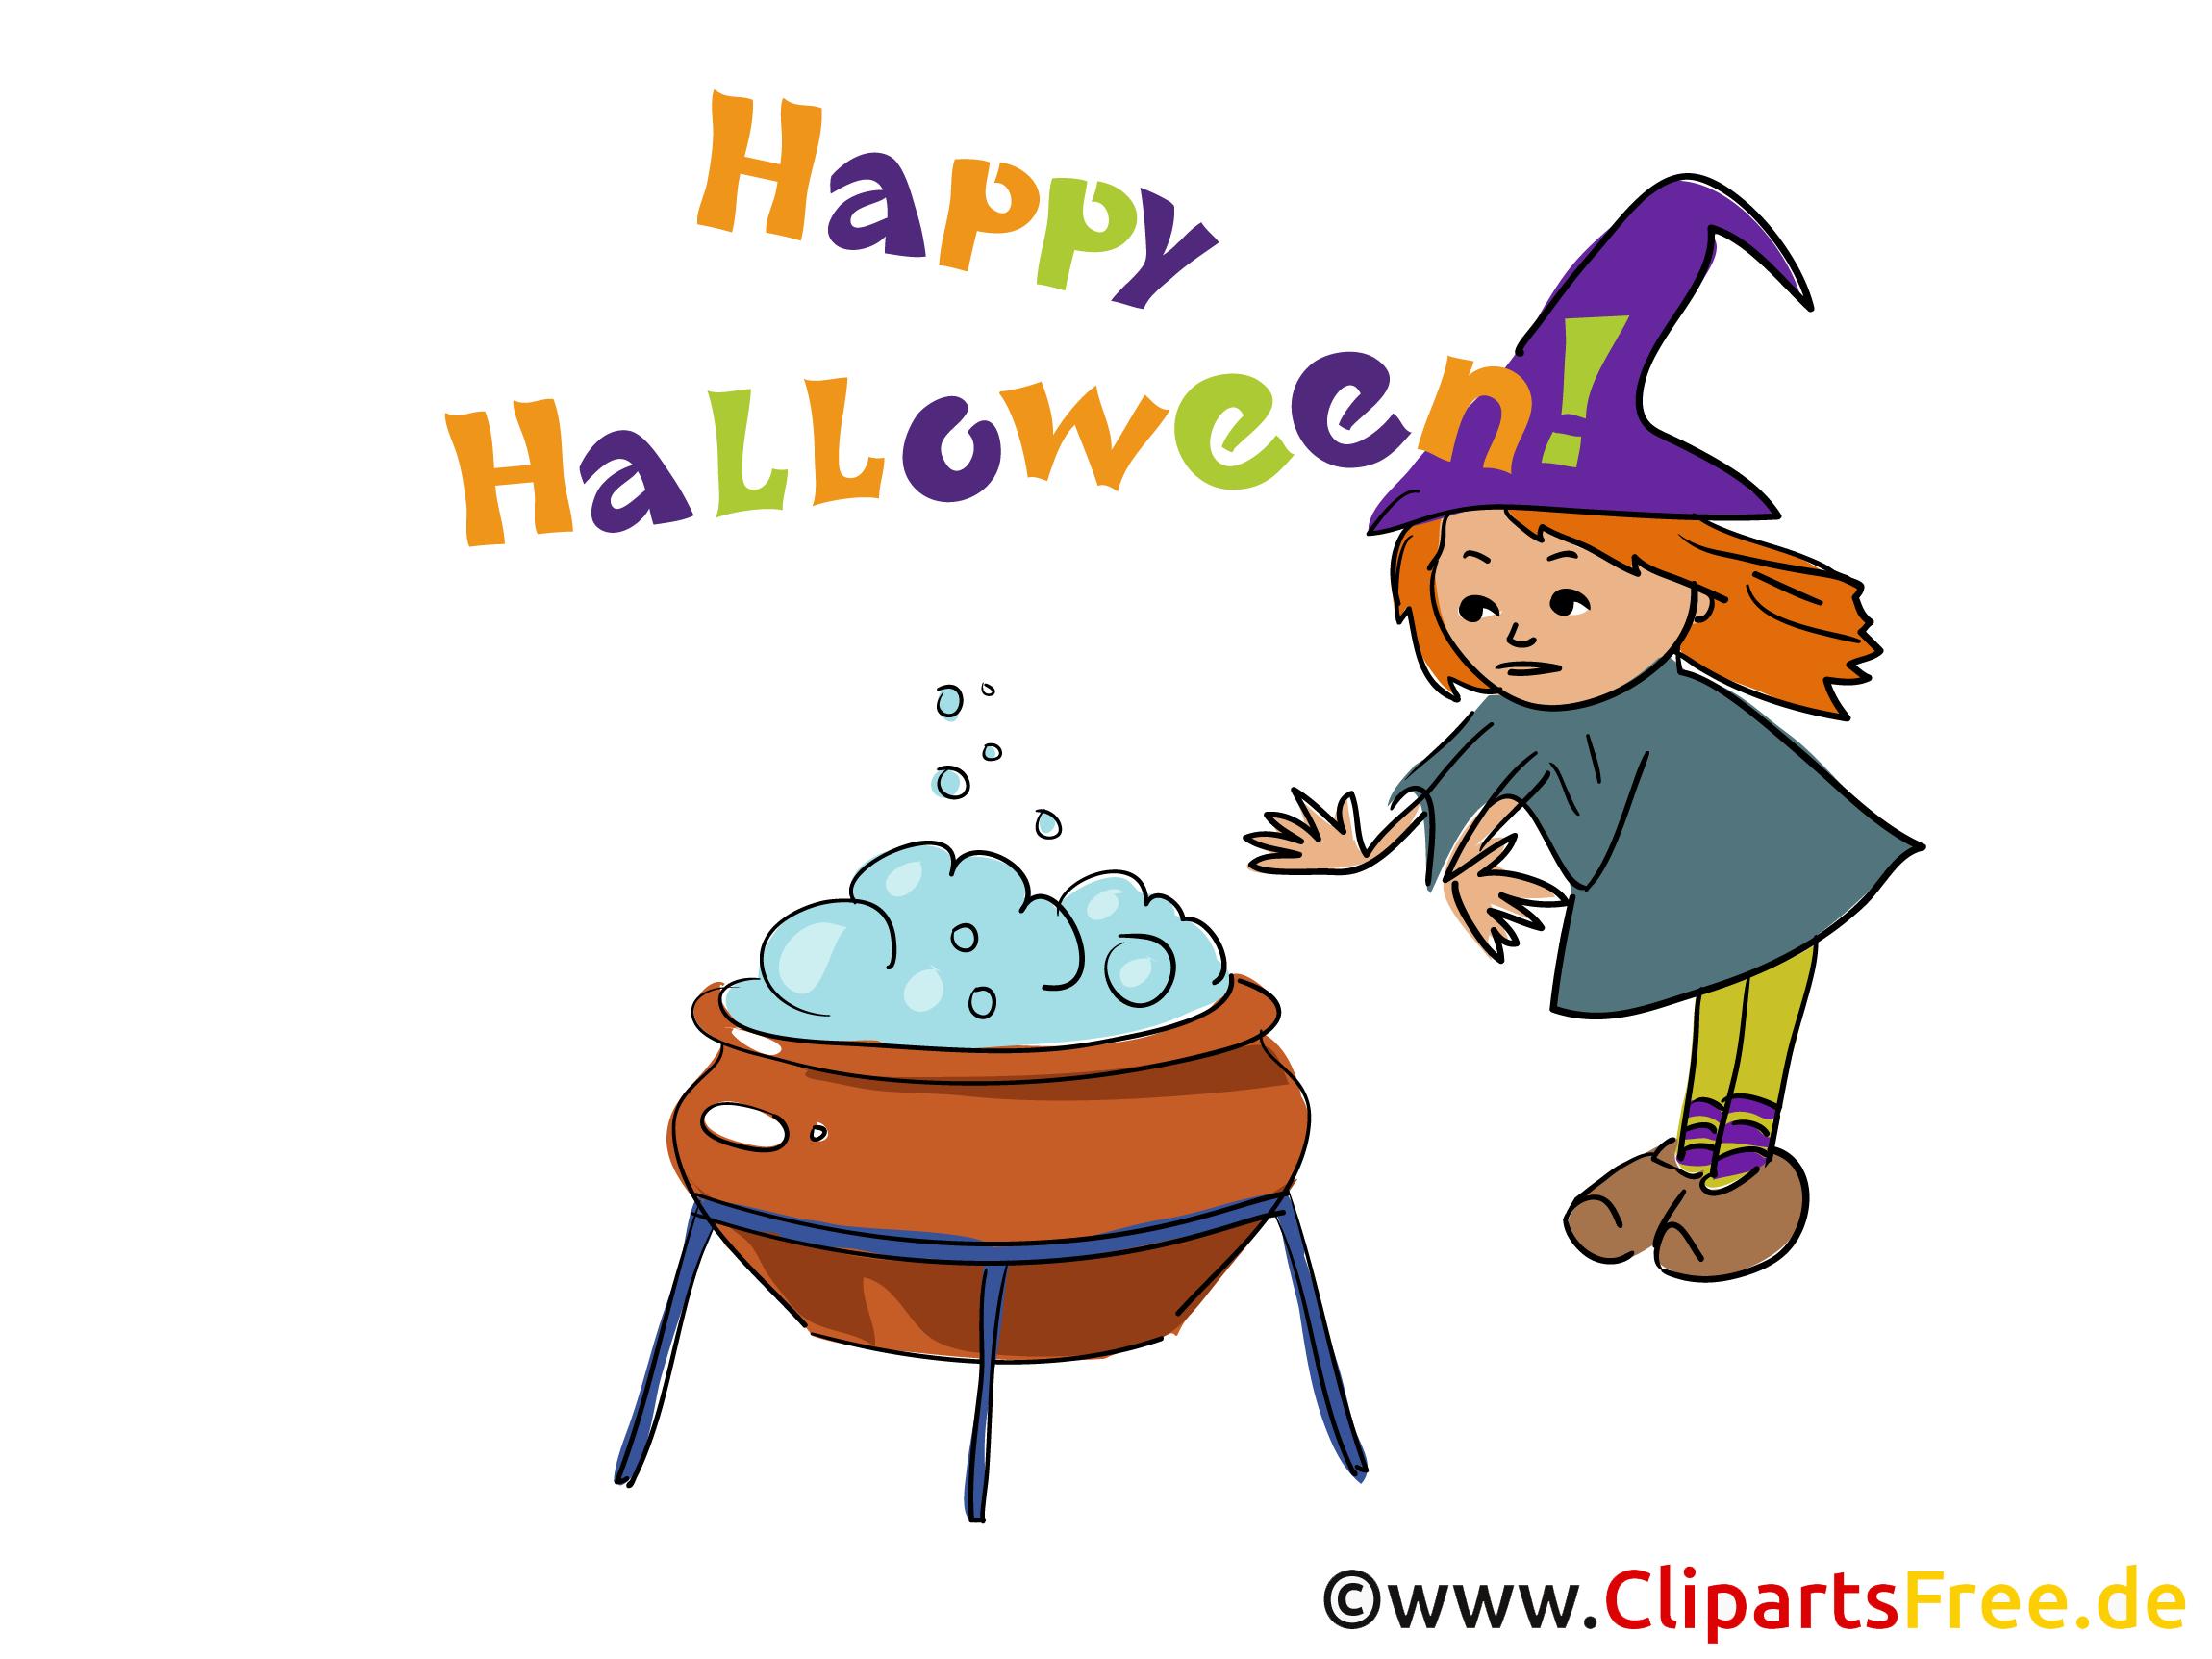 Hexe mit Kessel Clipart, Bild, Cartoon zu Halloween